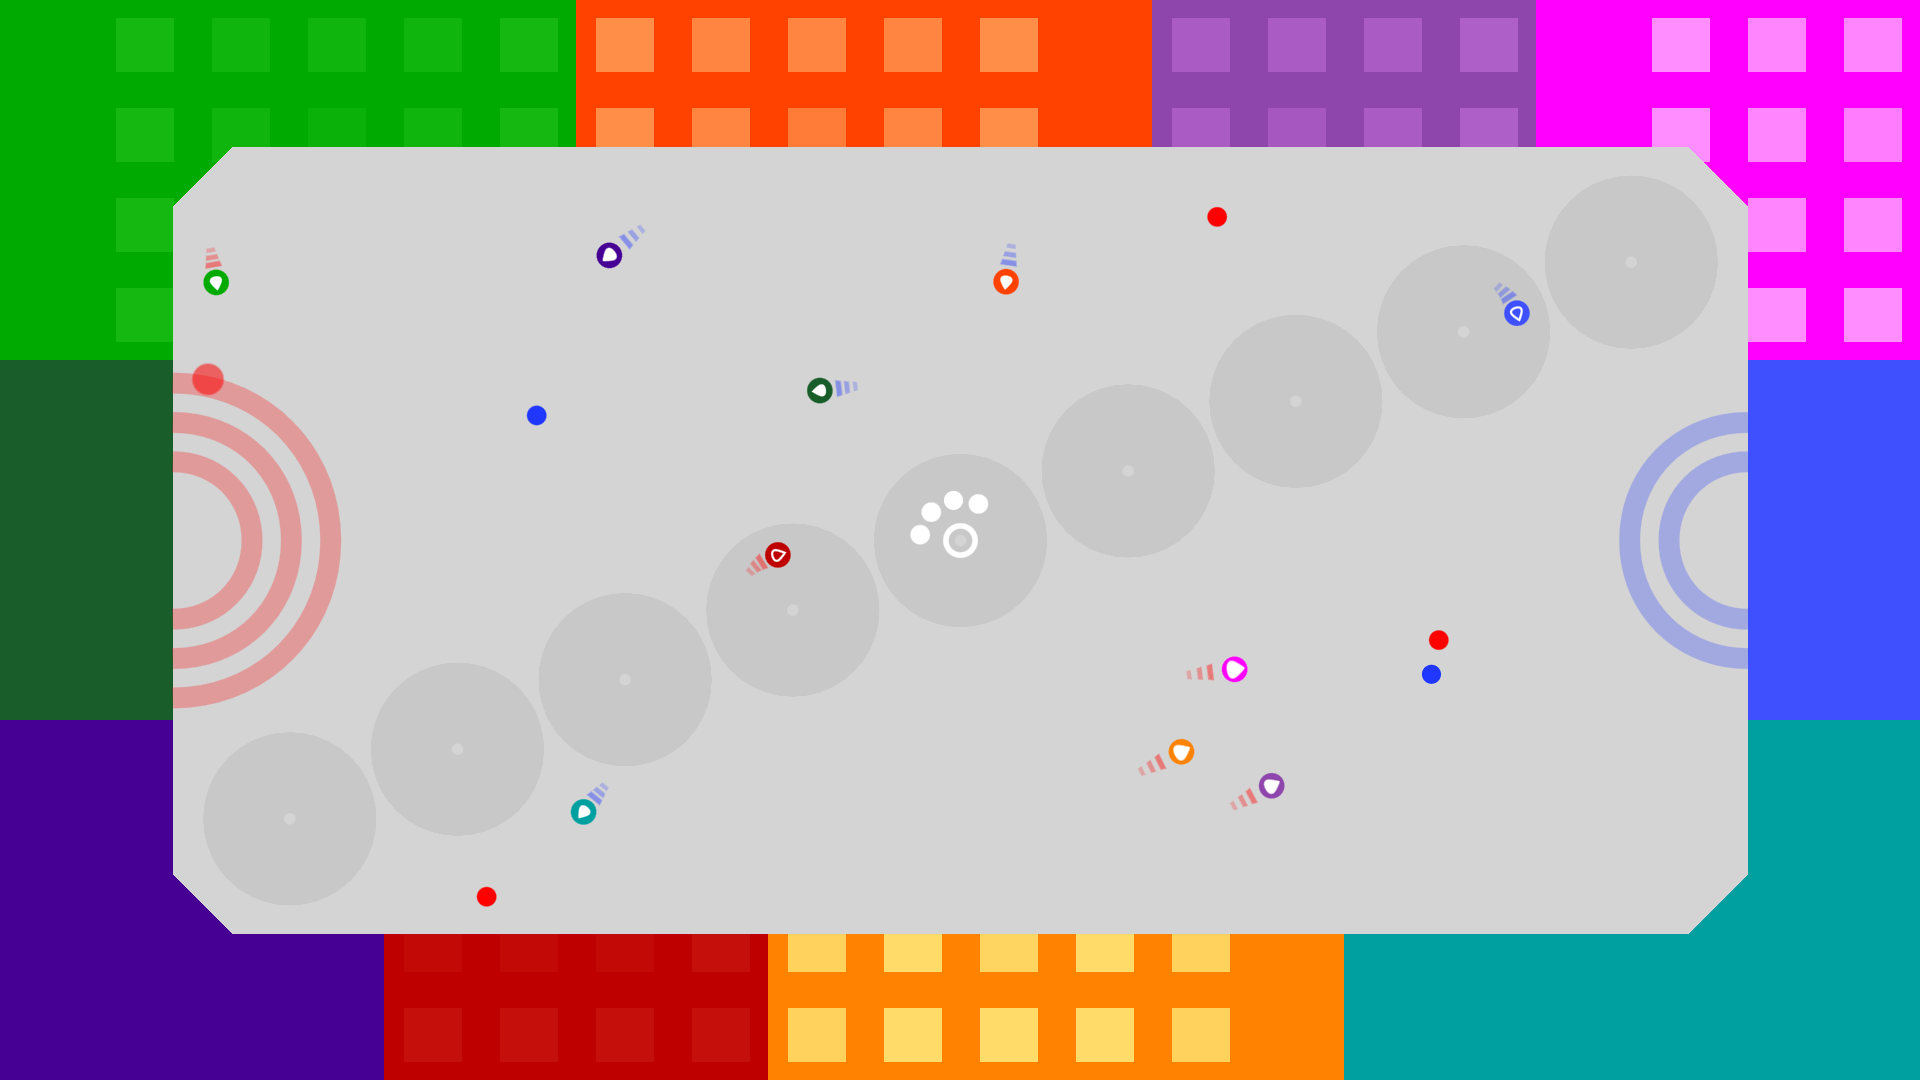 Game image 12 Orbits